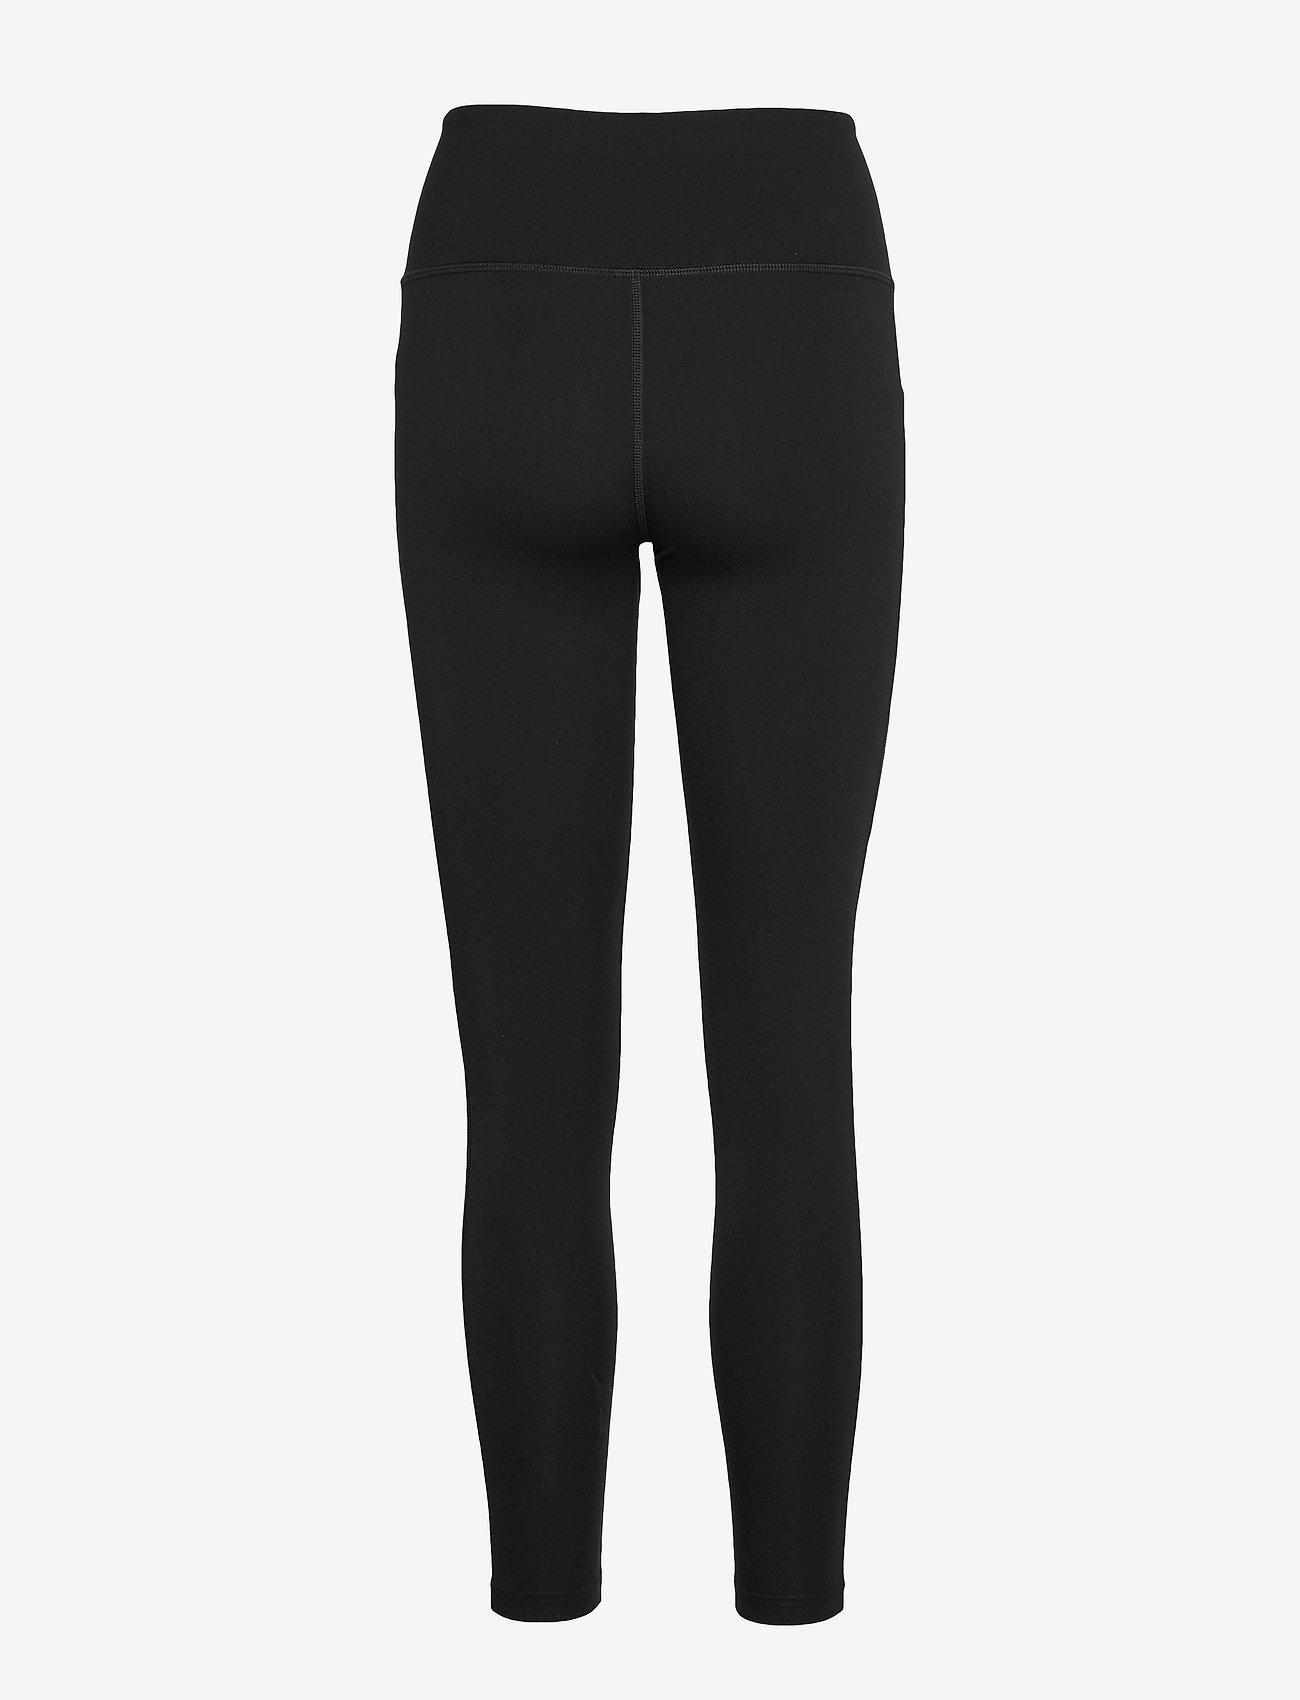 2XU - FORM STASH HI-RISE COMPRESSIO - sportleggings - black/white - 1